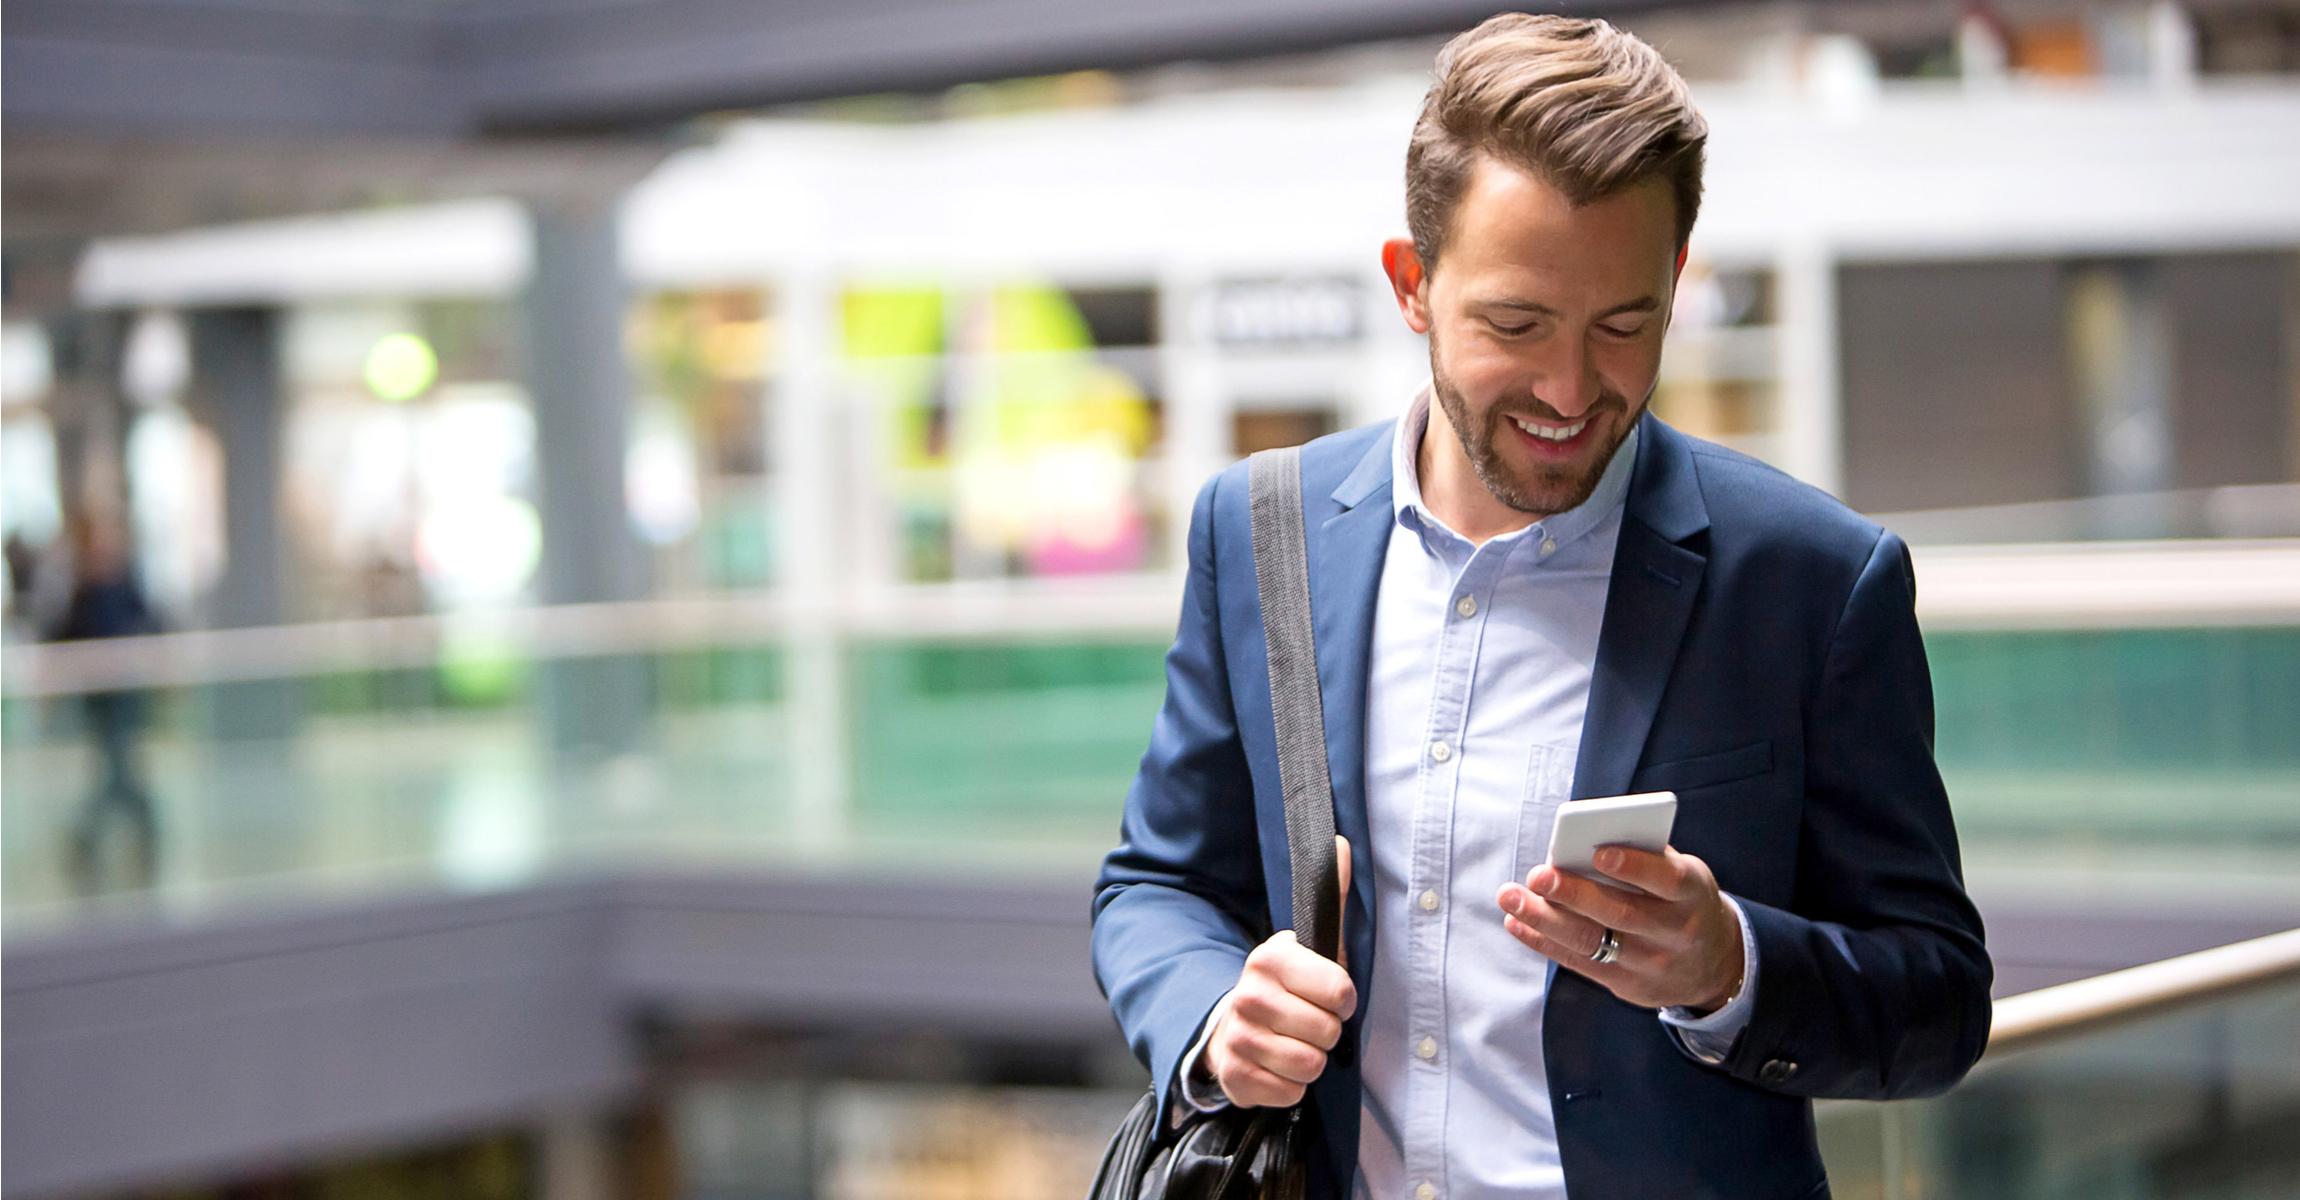 MAN_USING_MOBILE_PHONE